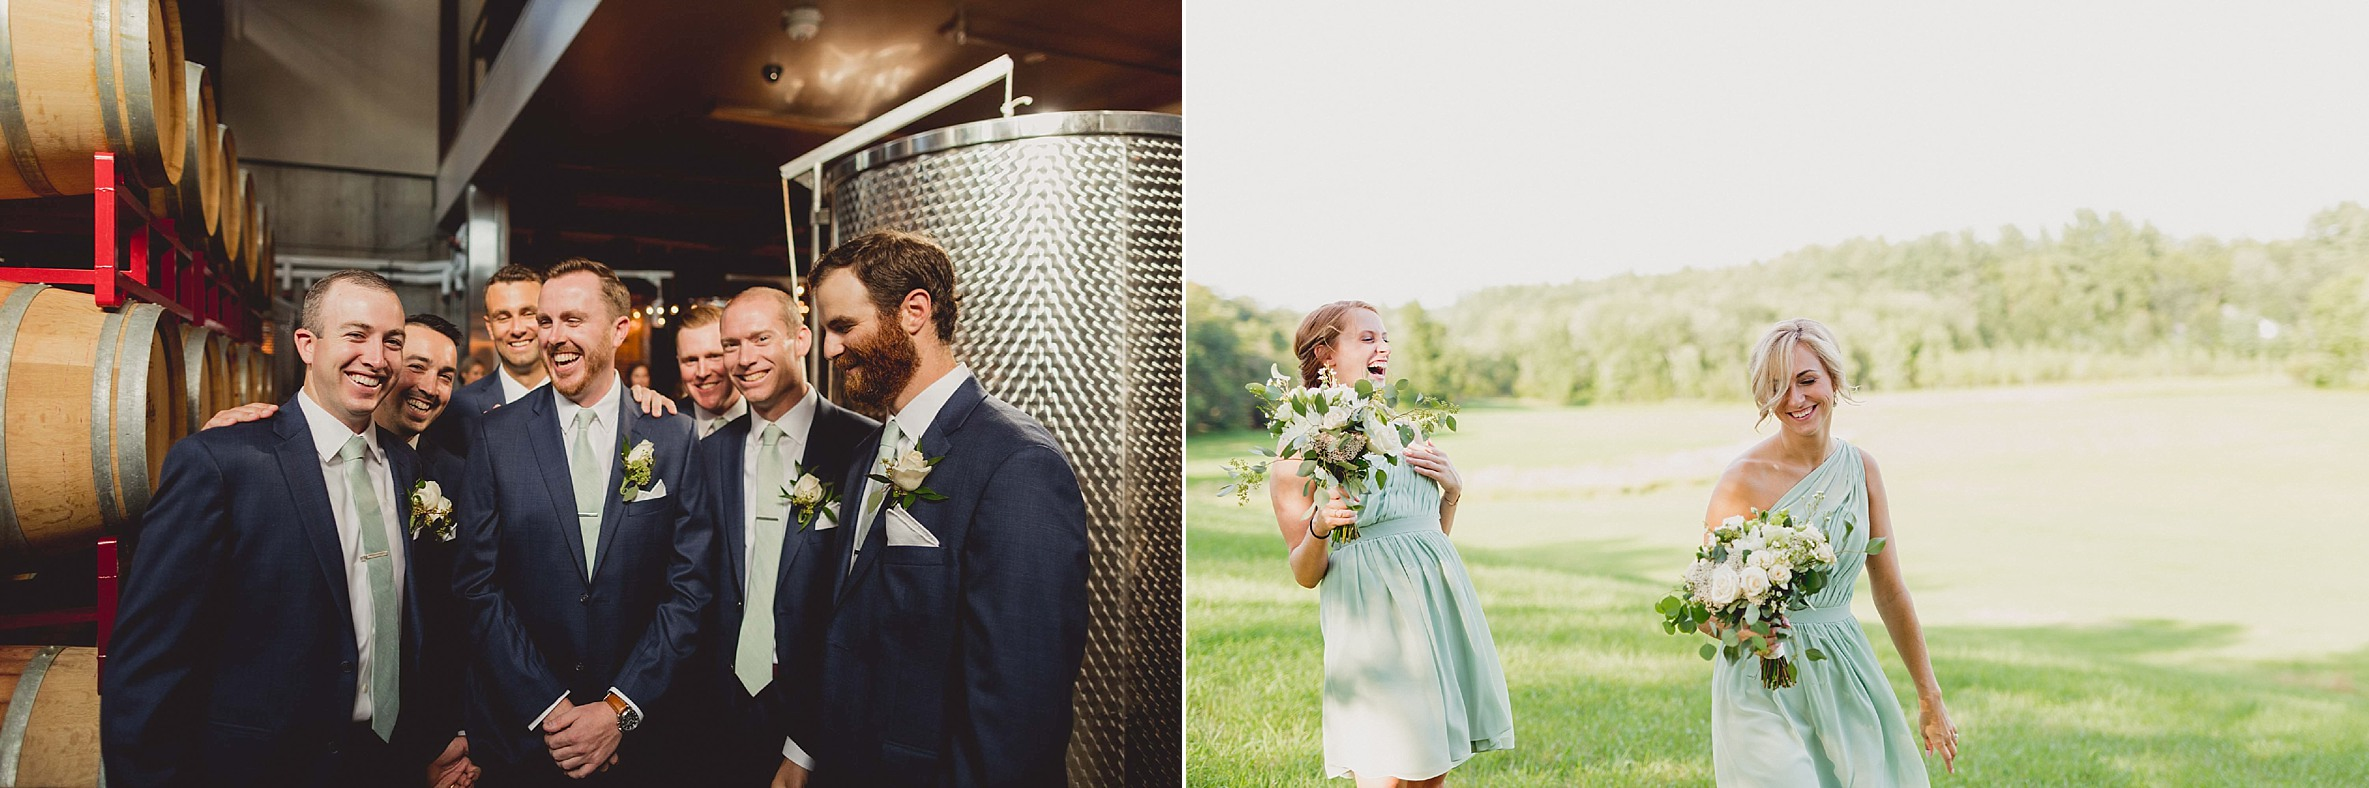 labelle winery wedding-29.jpg